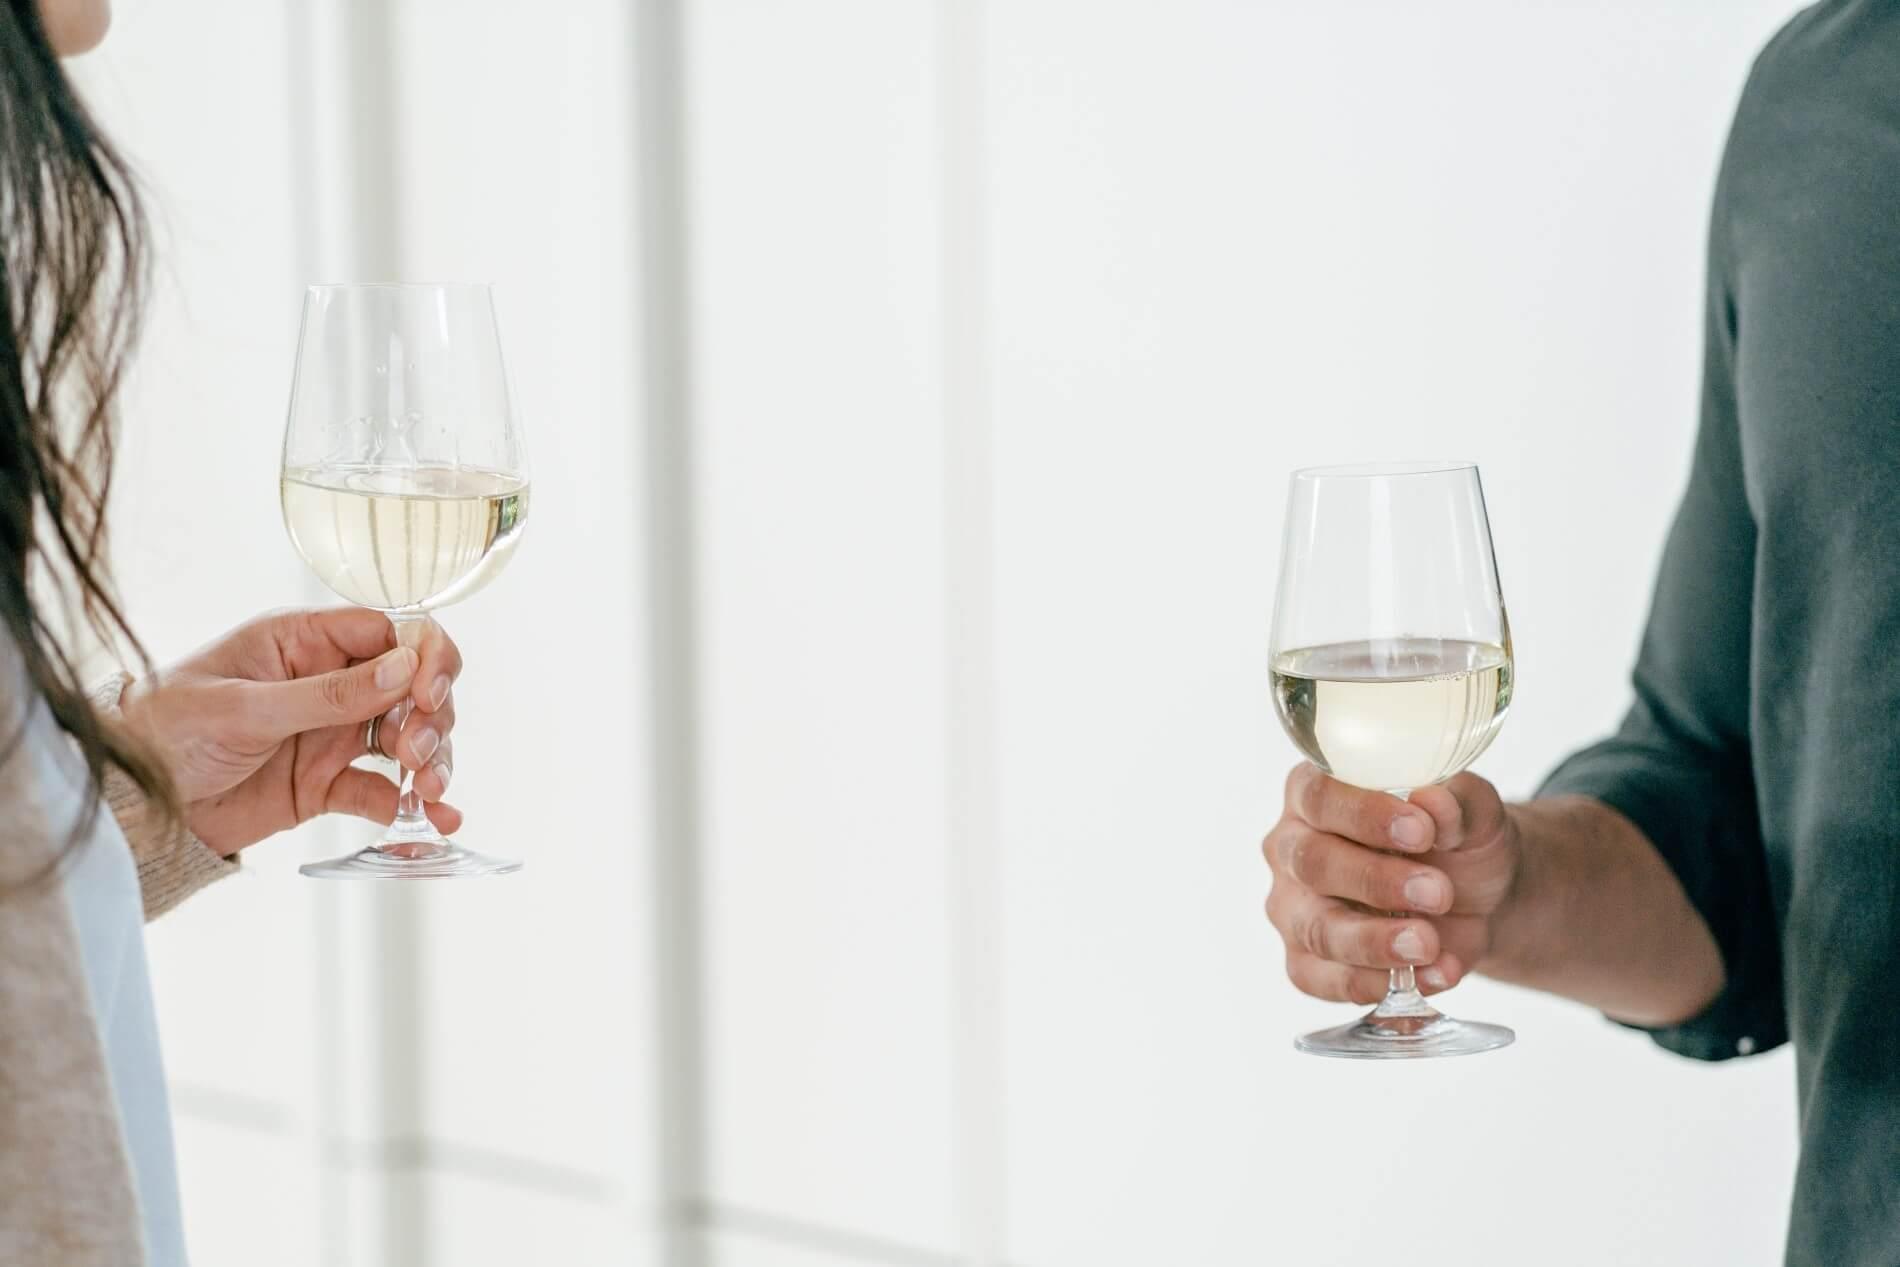 STONELEIGH-generic white wine glasses (1) (1)